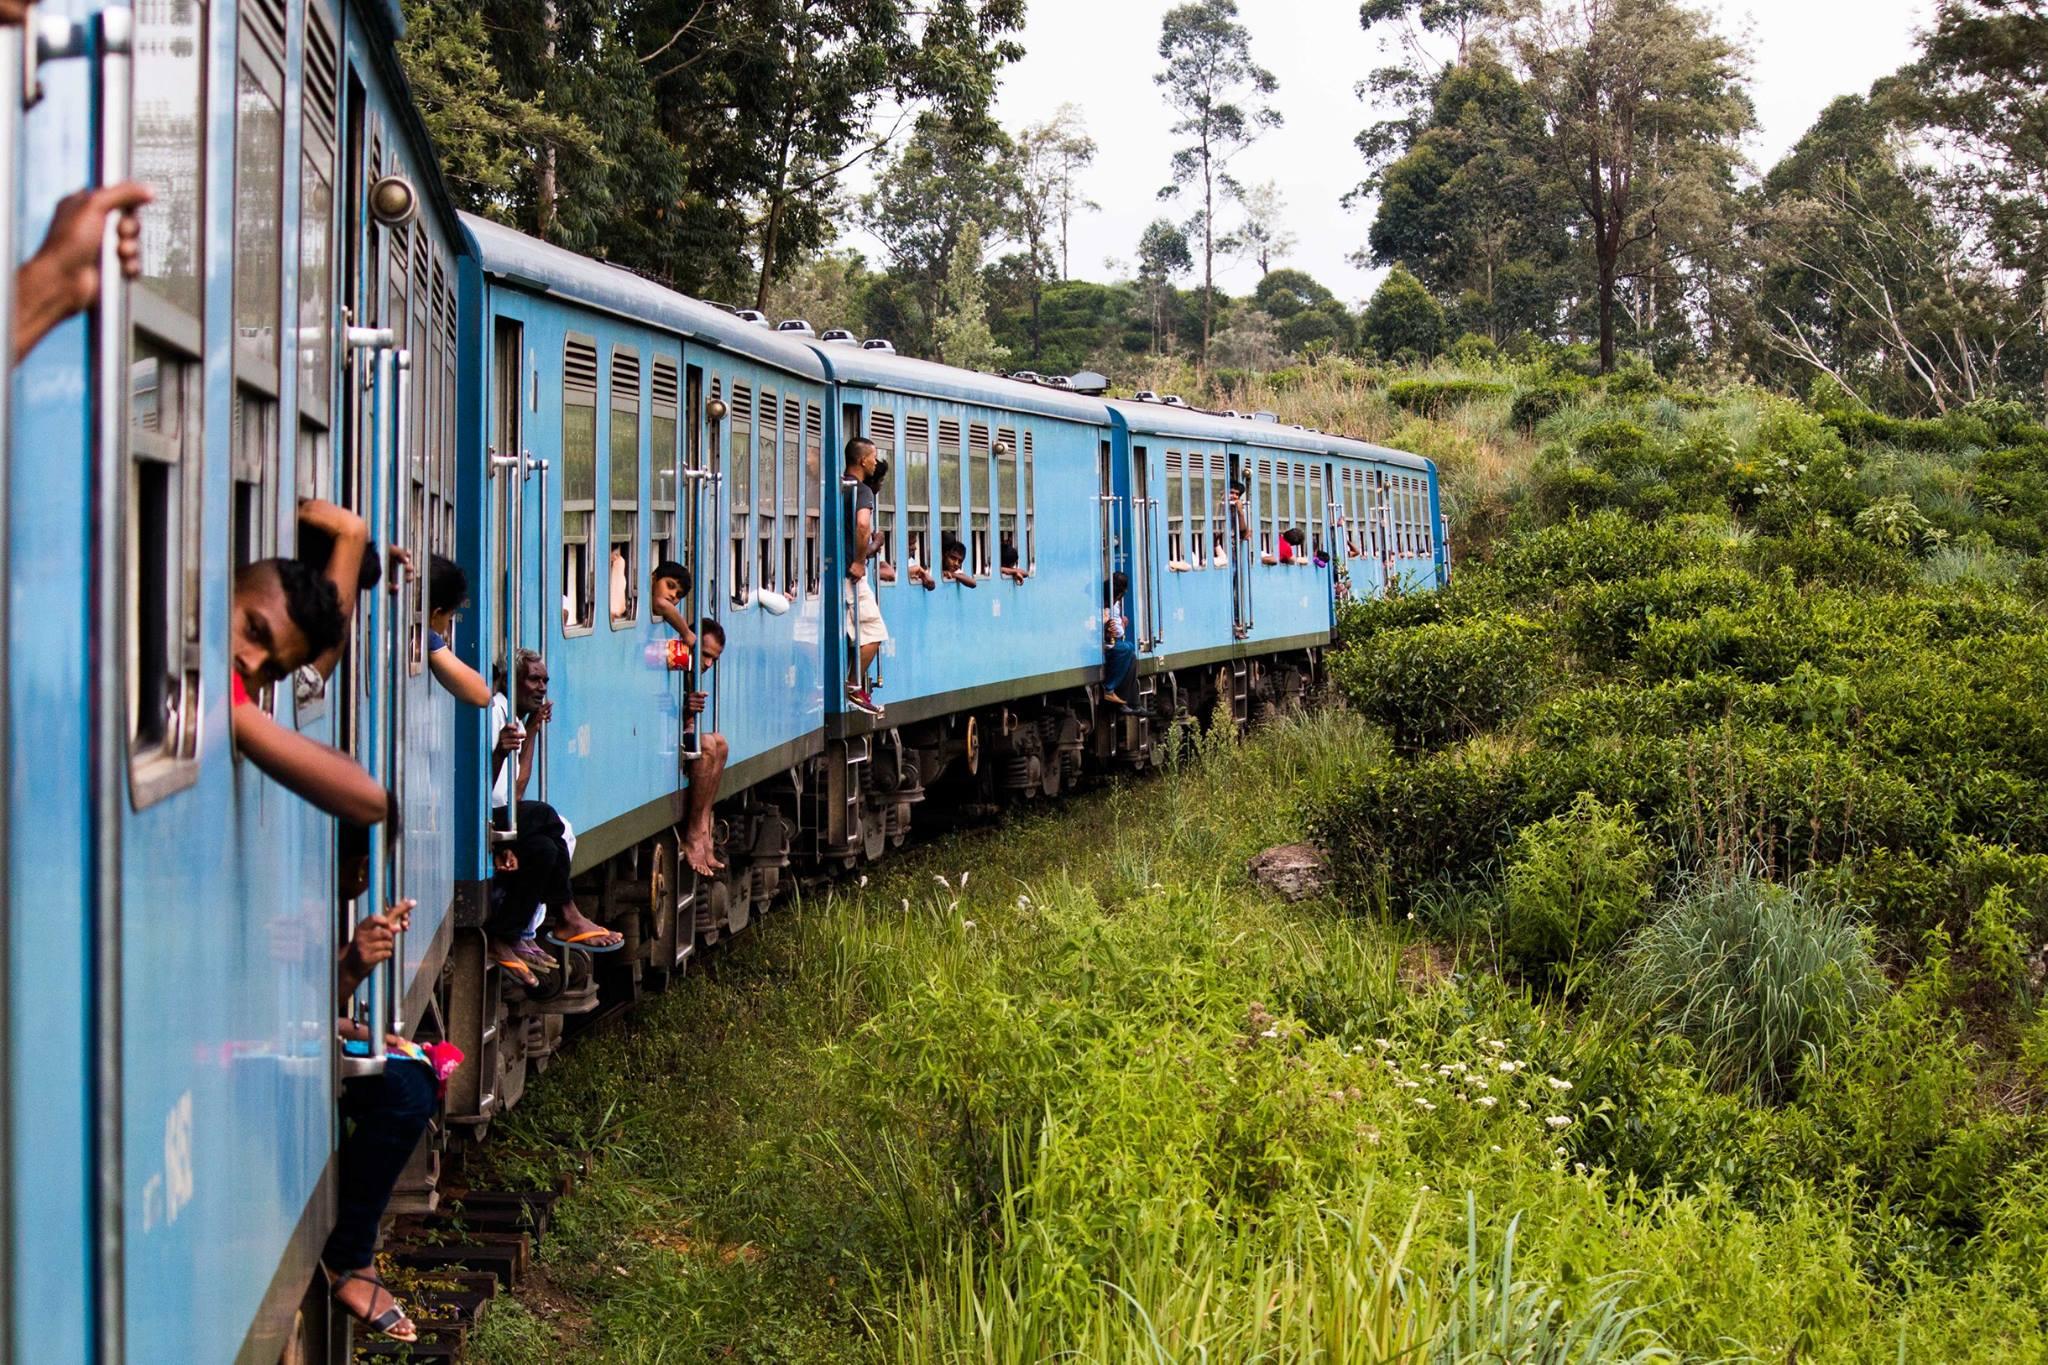 invite-to-paradise-sri-lanka-and-maldives-specialists-travel-agent-tour-operator-customer-review--feedback-joel-rhian-train-1.jpg